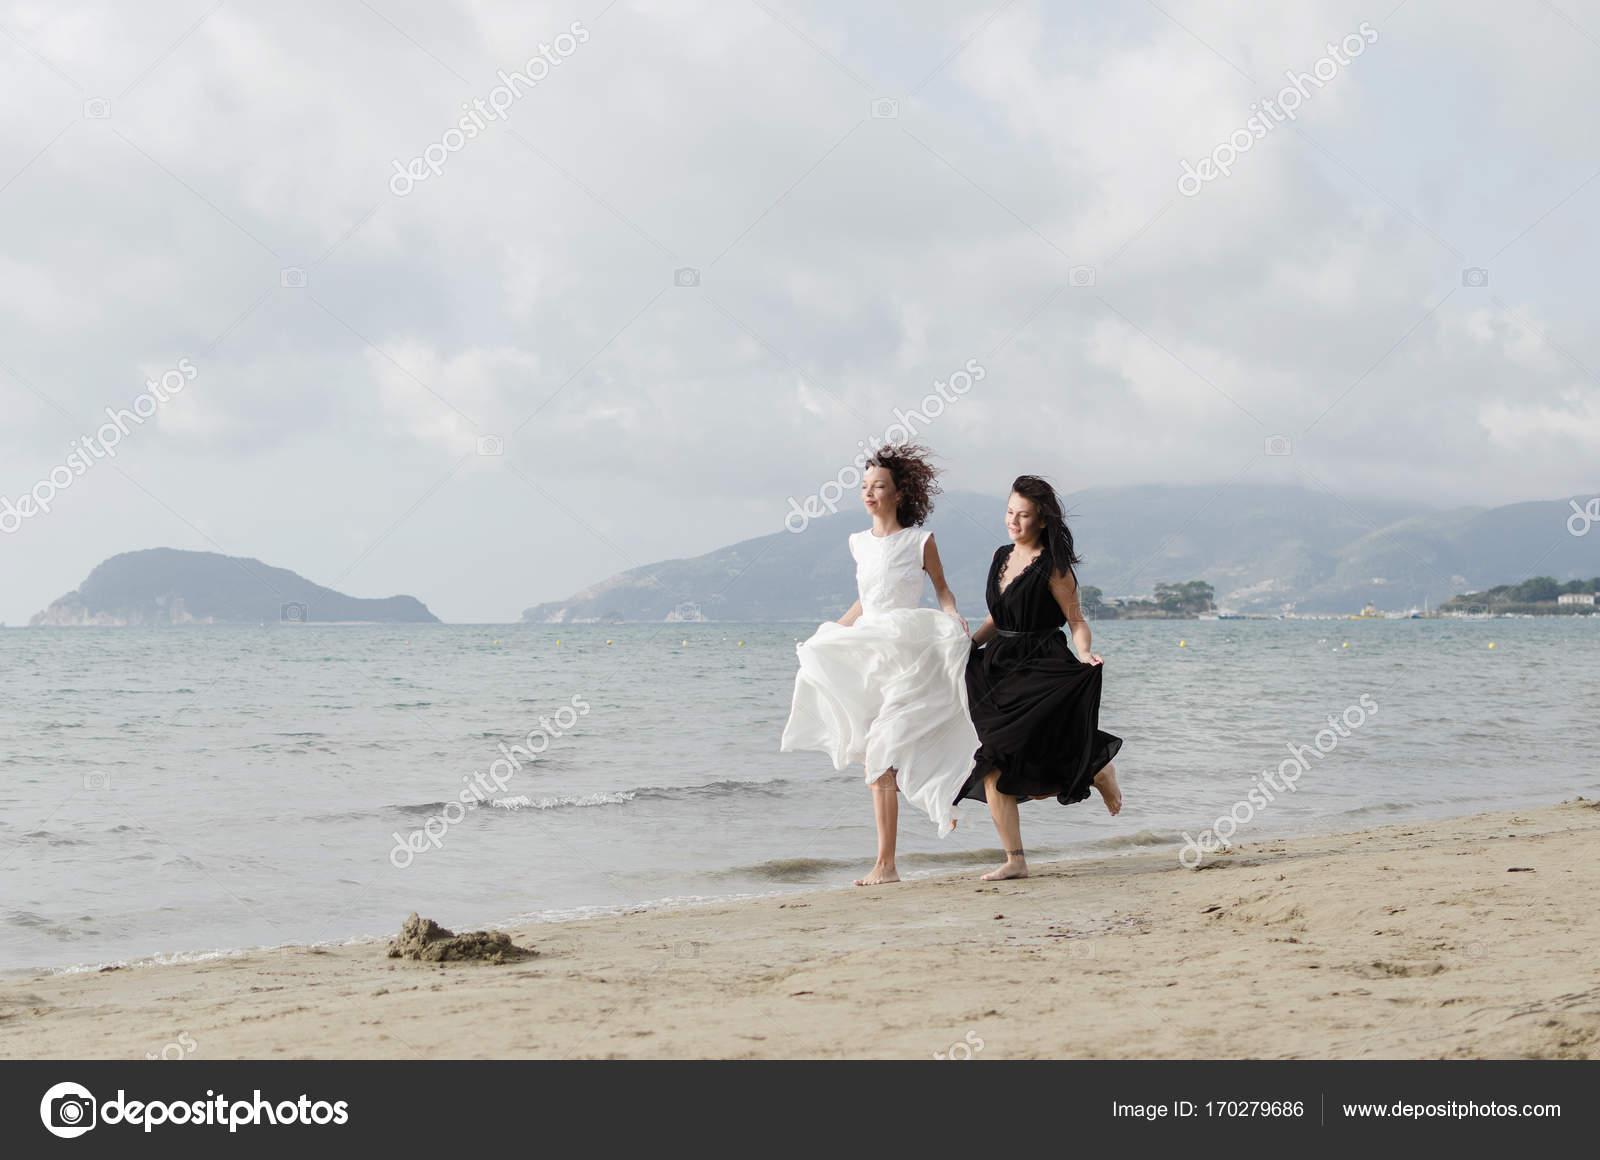 a40207ce554 Δύο γυναίκες σε μαύρο και άσπρο κομψό φορέματα τρέχει με τον άνεμο στην  αμμώδη παραλία κοντά στη θάλασσα. Φέρουν τρίχωμα — Εικόνα από ...